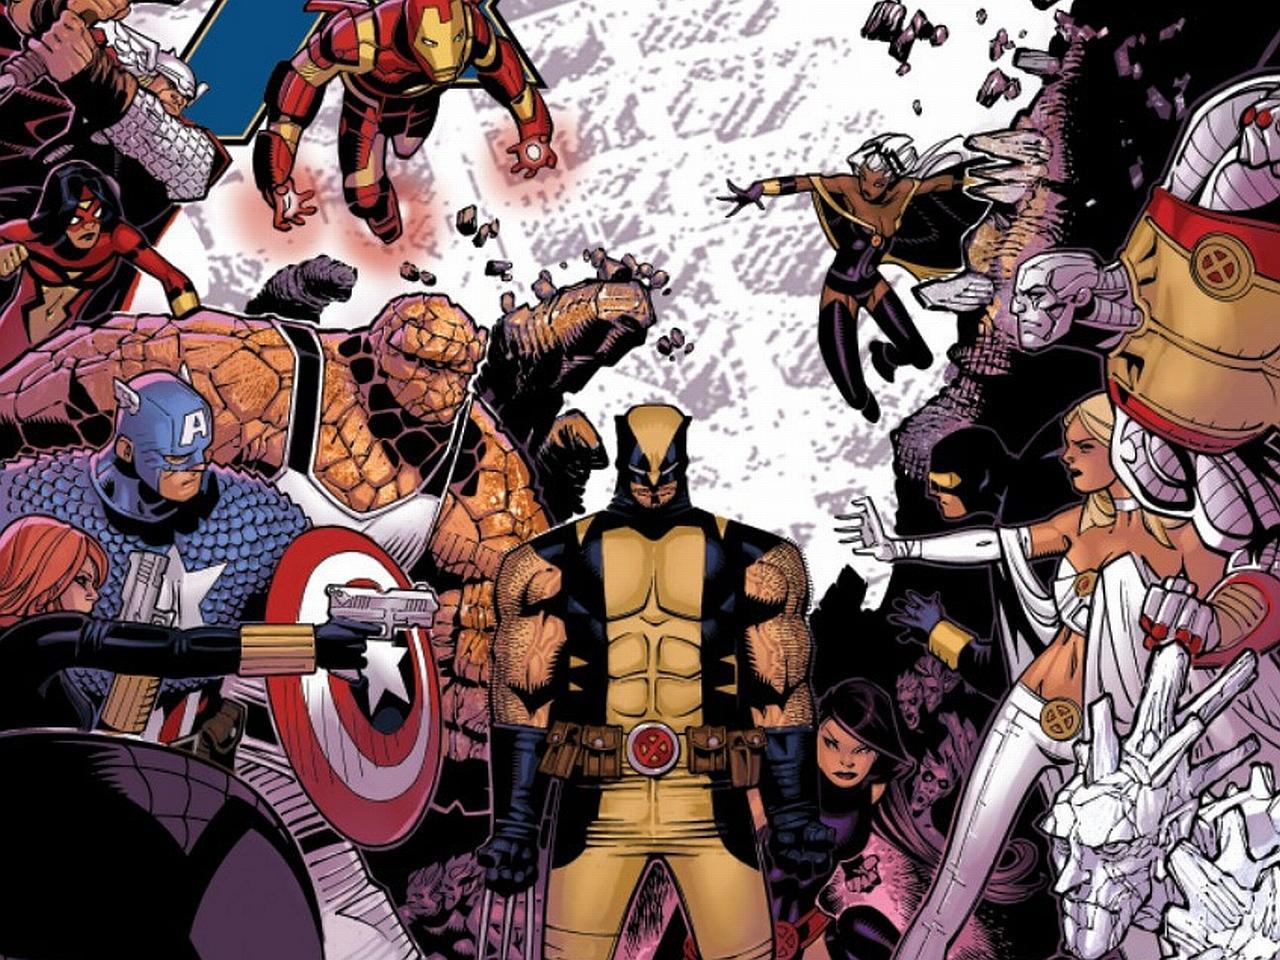 Avengers Vs. X-Men wallpapers HD quality